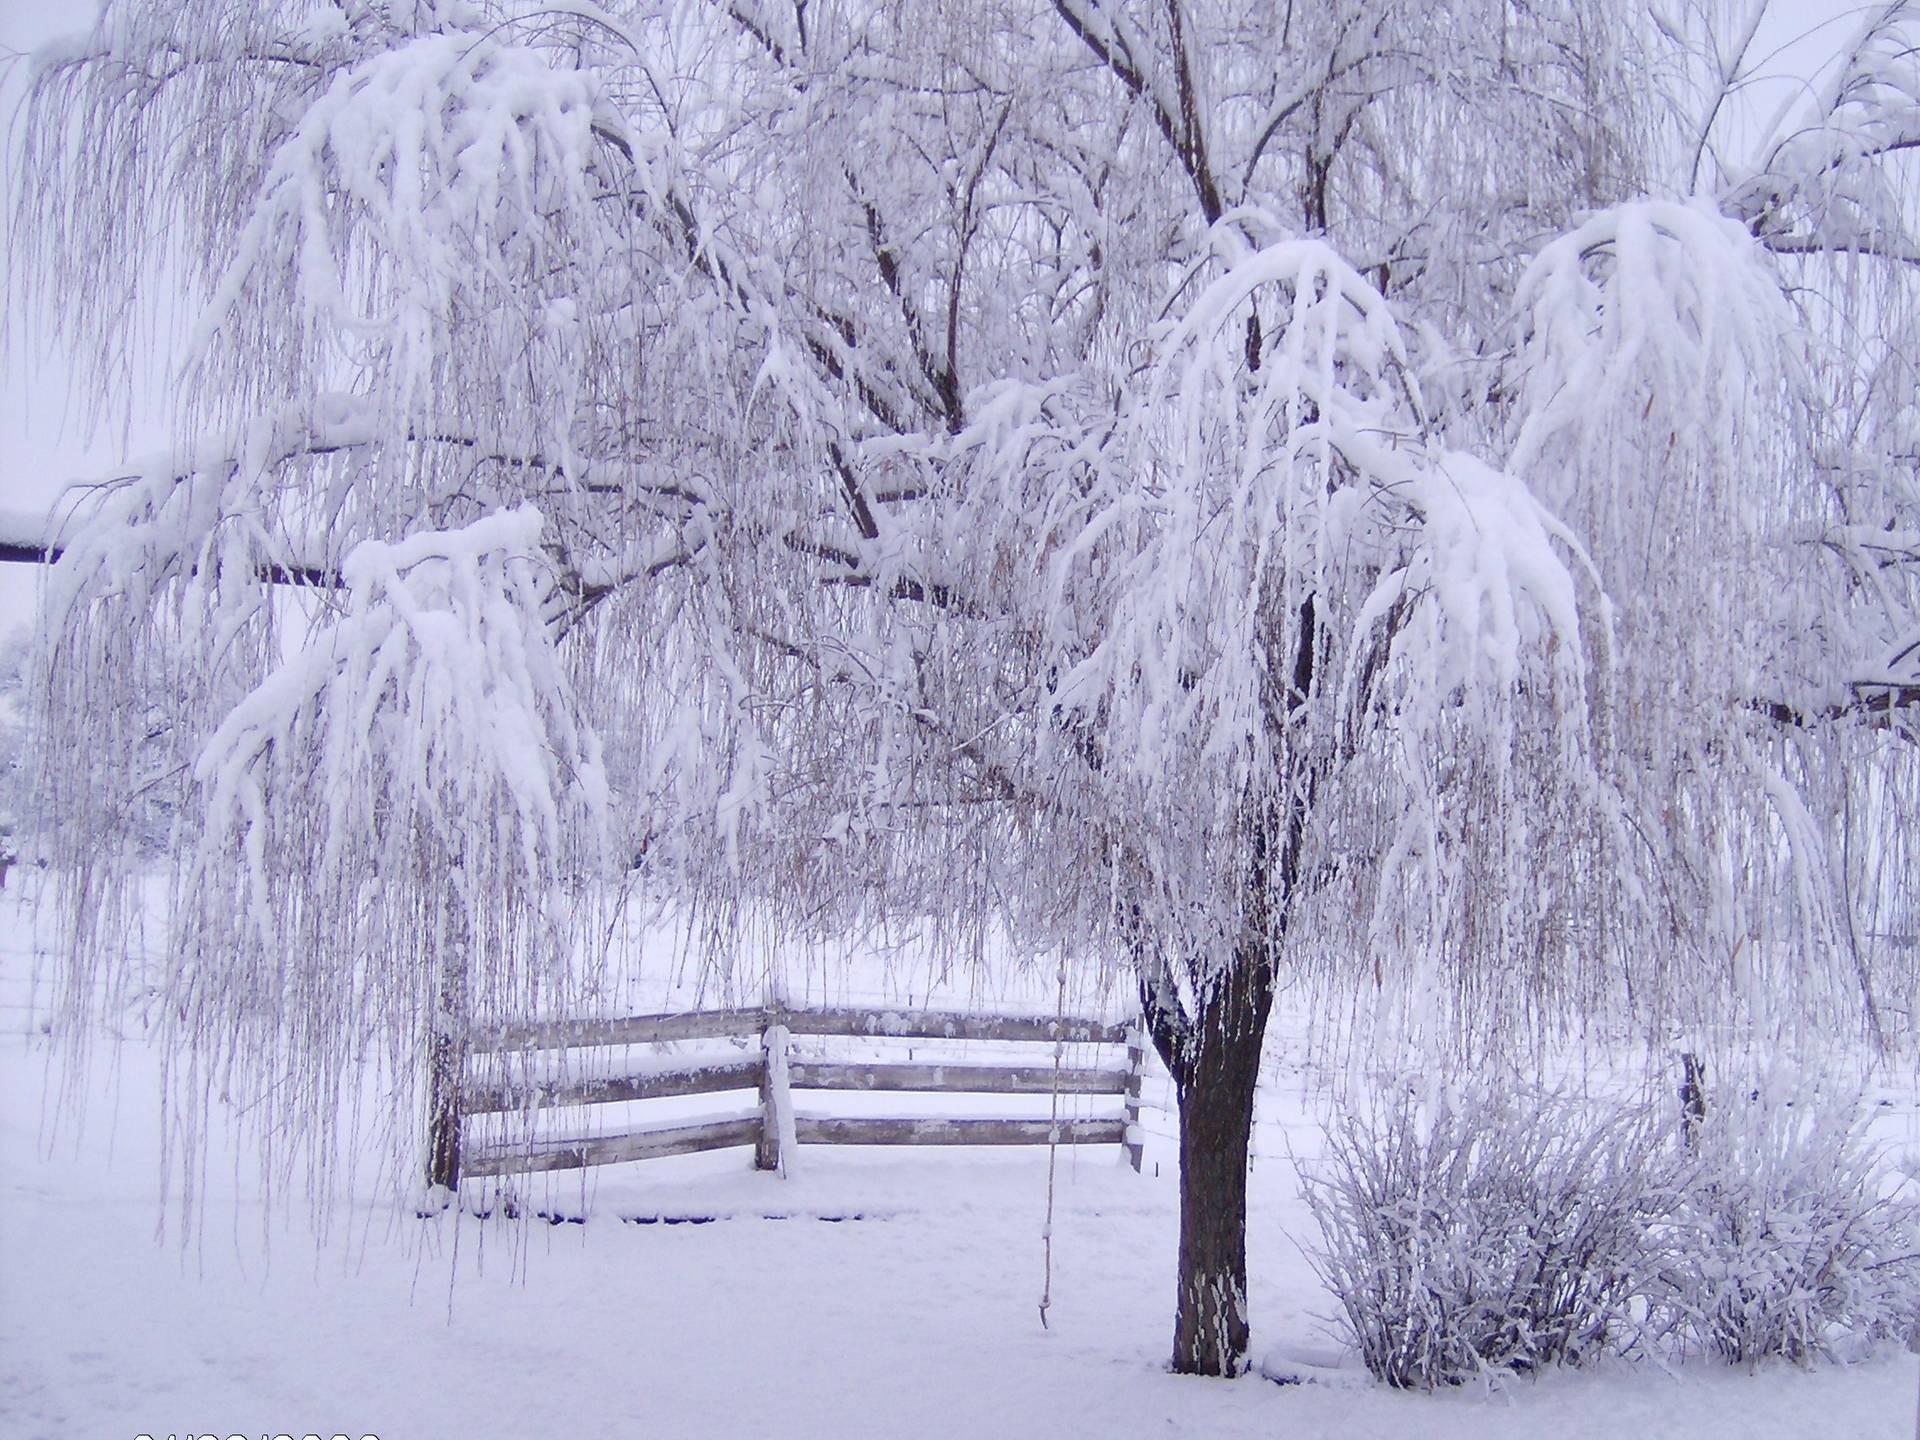 Winter Screensavers 10 Backgrounds | Wallruru.